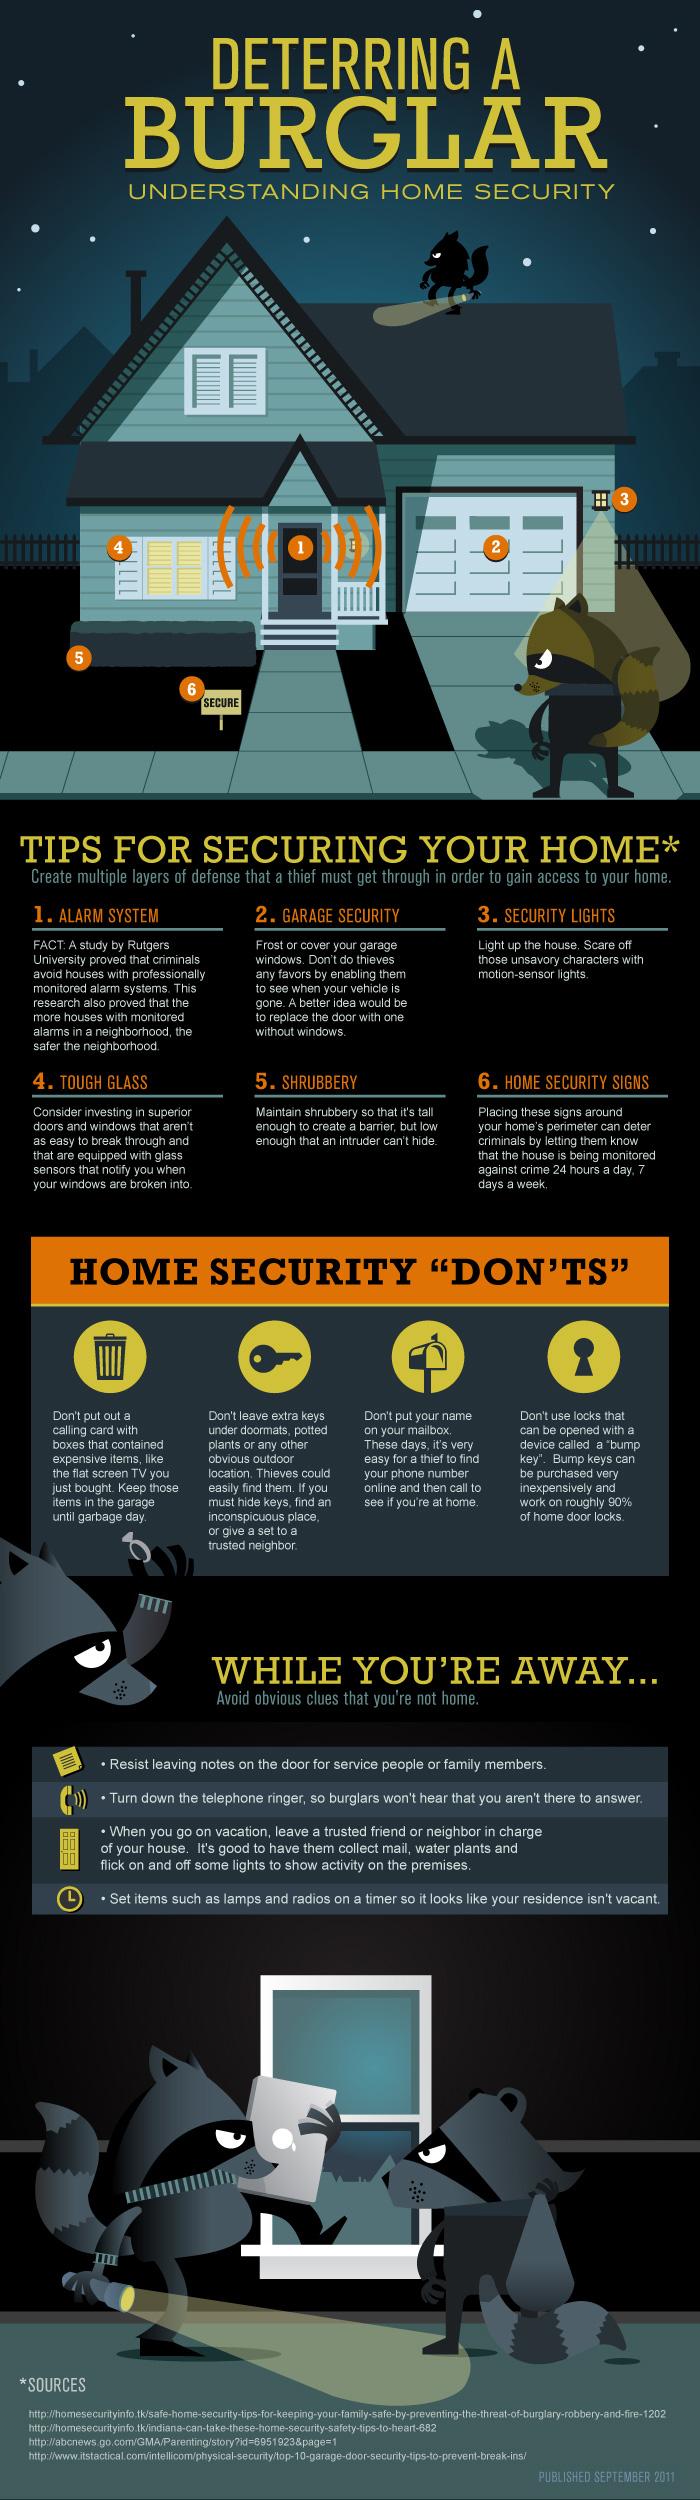 deterring-a-burglar infographic